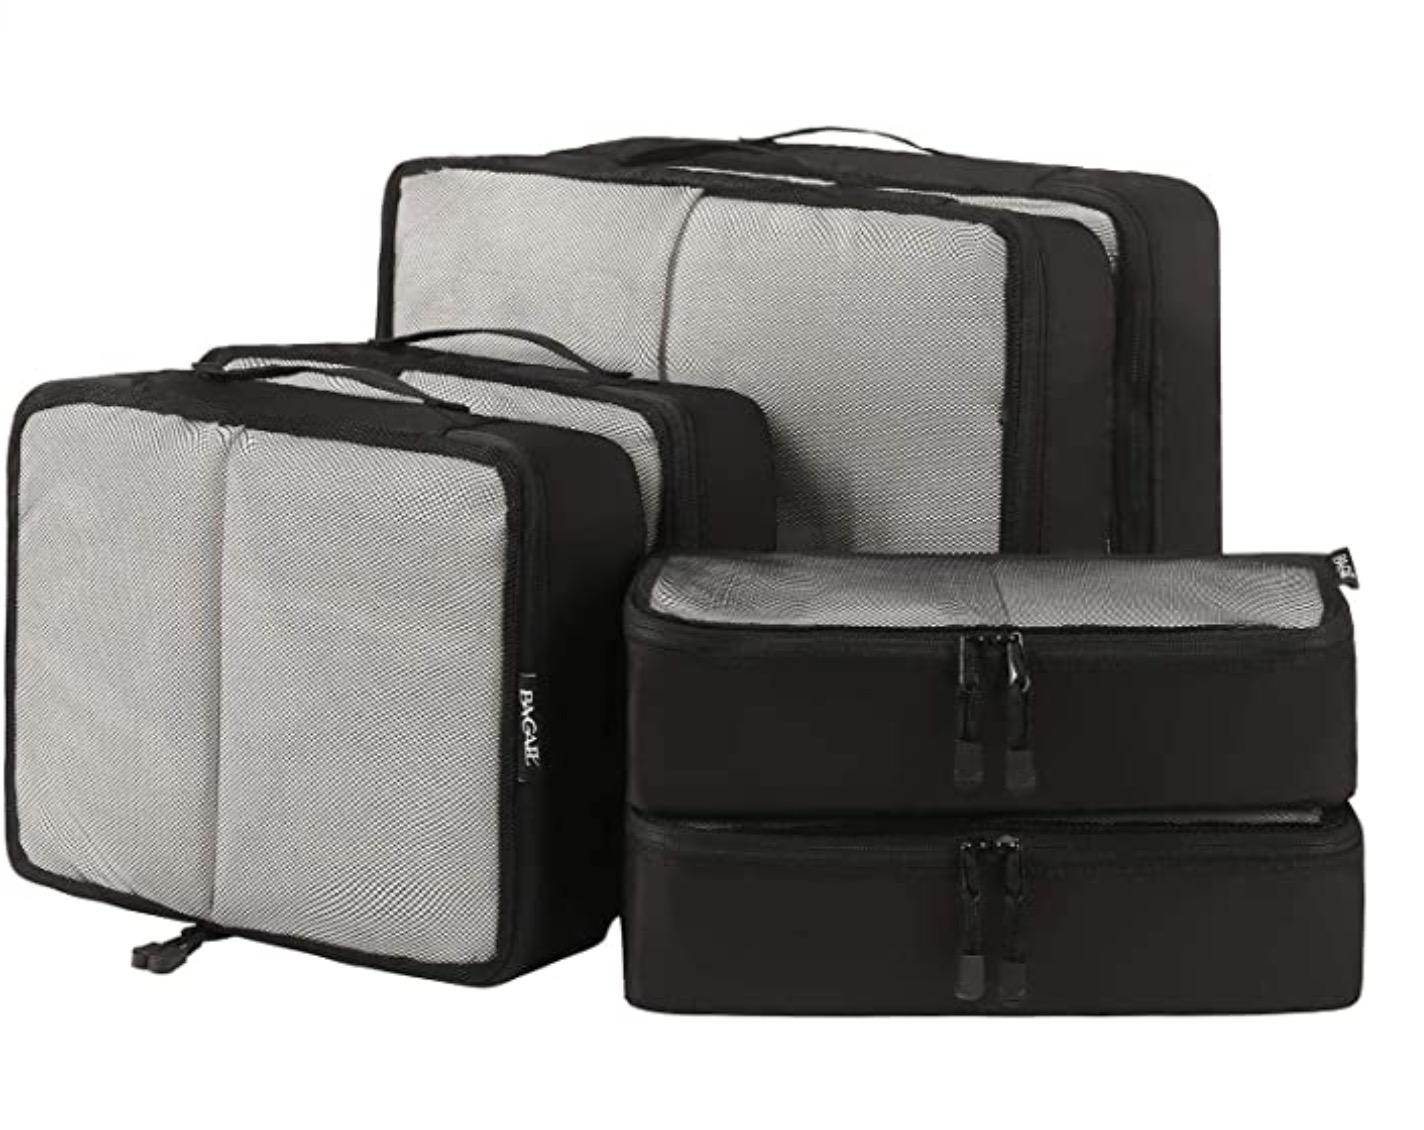 Men's Packing Cubes Travel AccessoryMen's Packing Cubes Travel Accessory